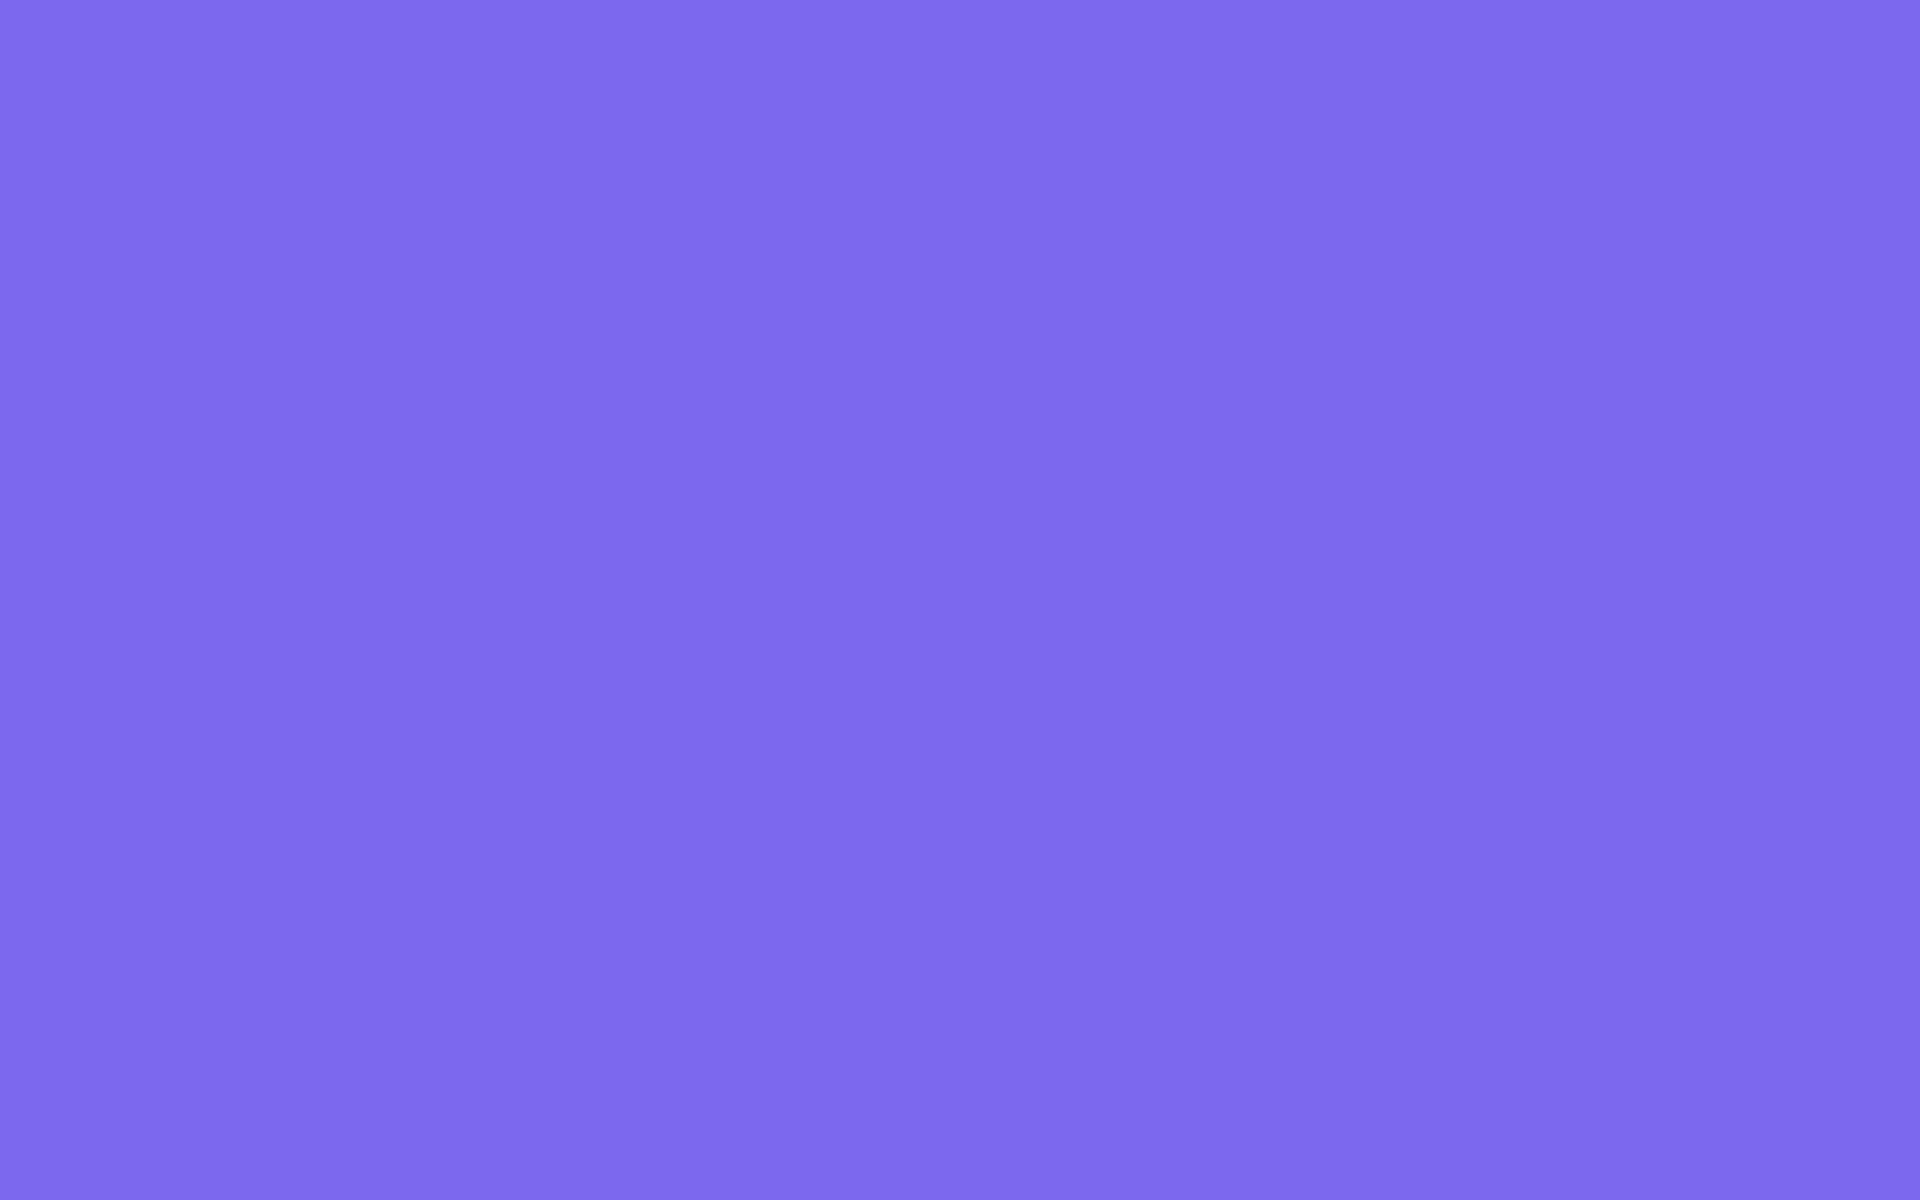 1920x1200 Medium Slate Blue Solid Color Background